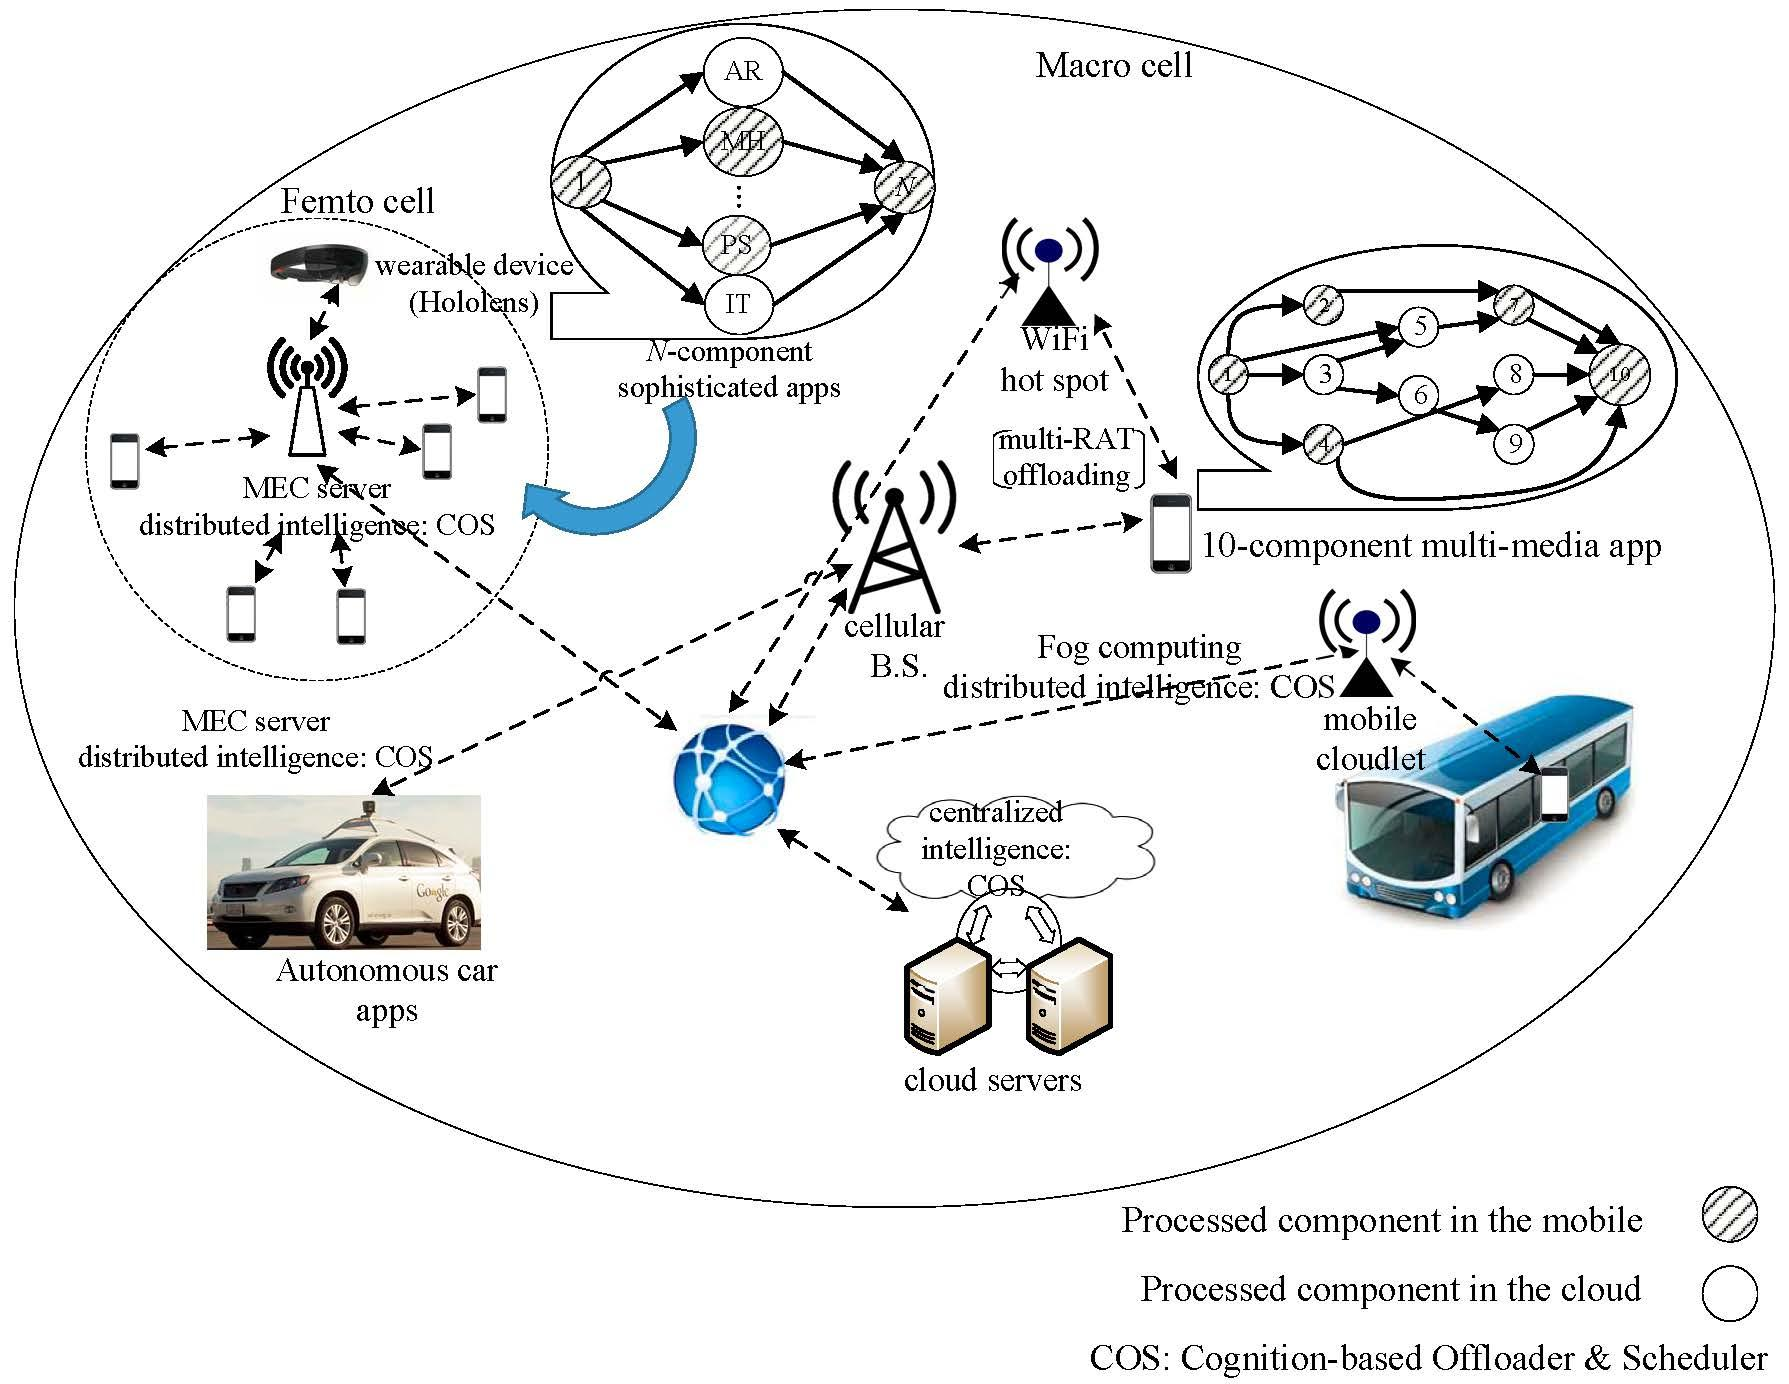 Cognitive Mobile Cloud Computing